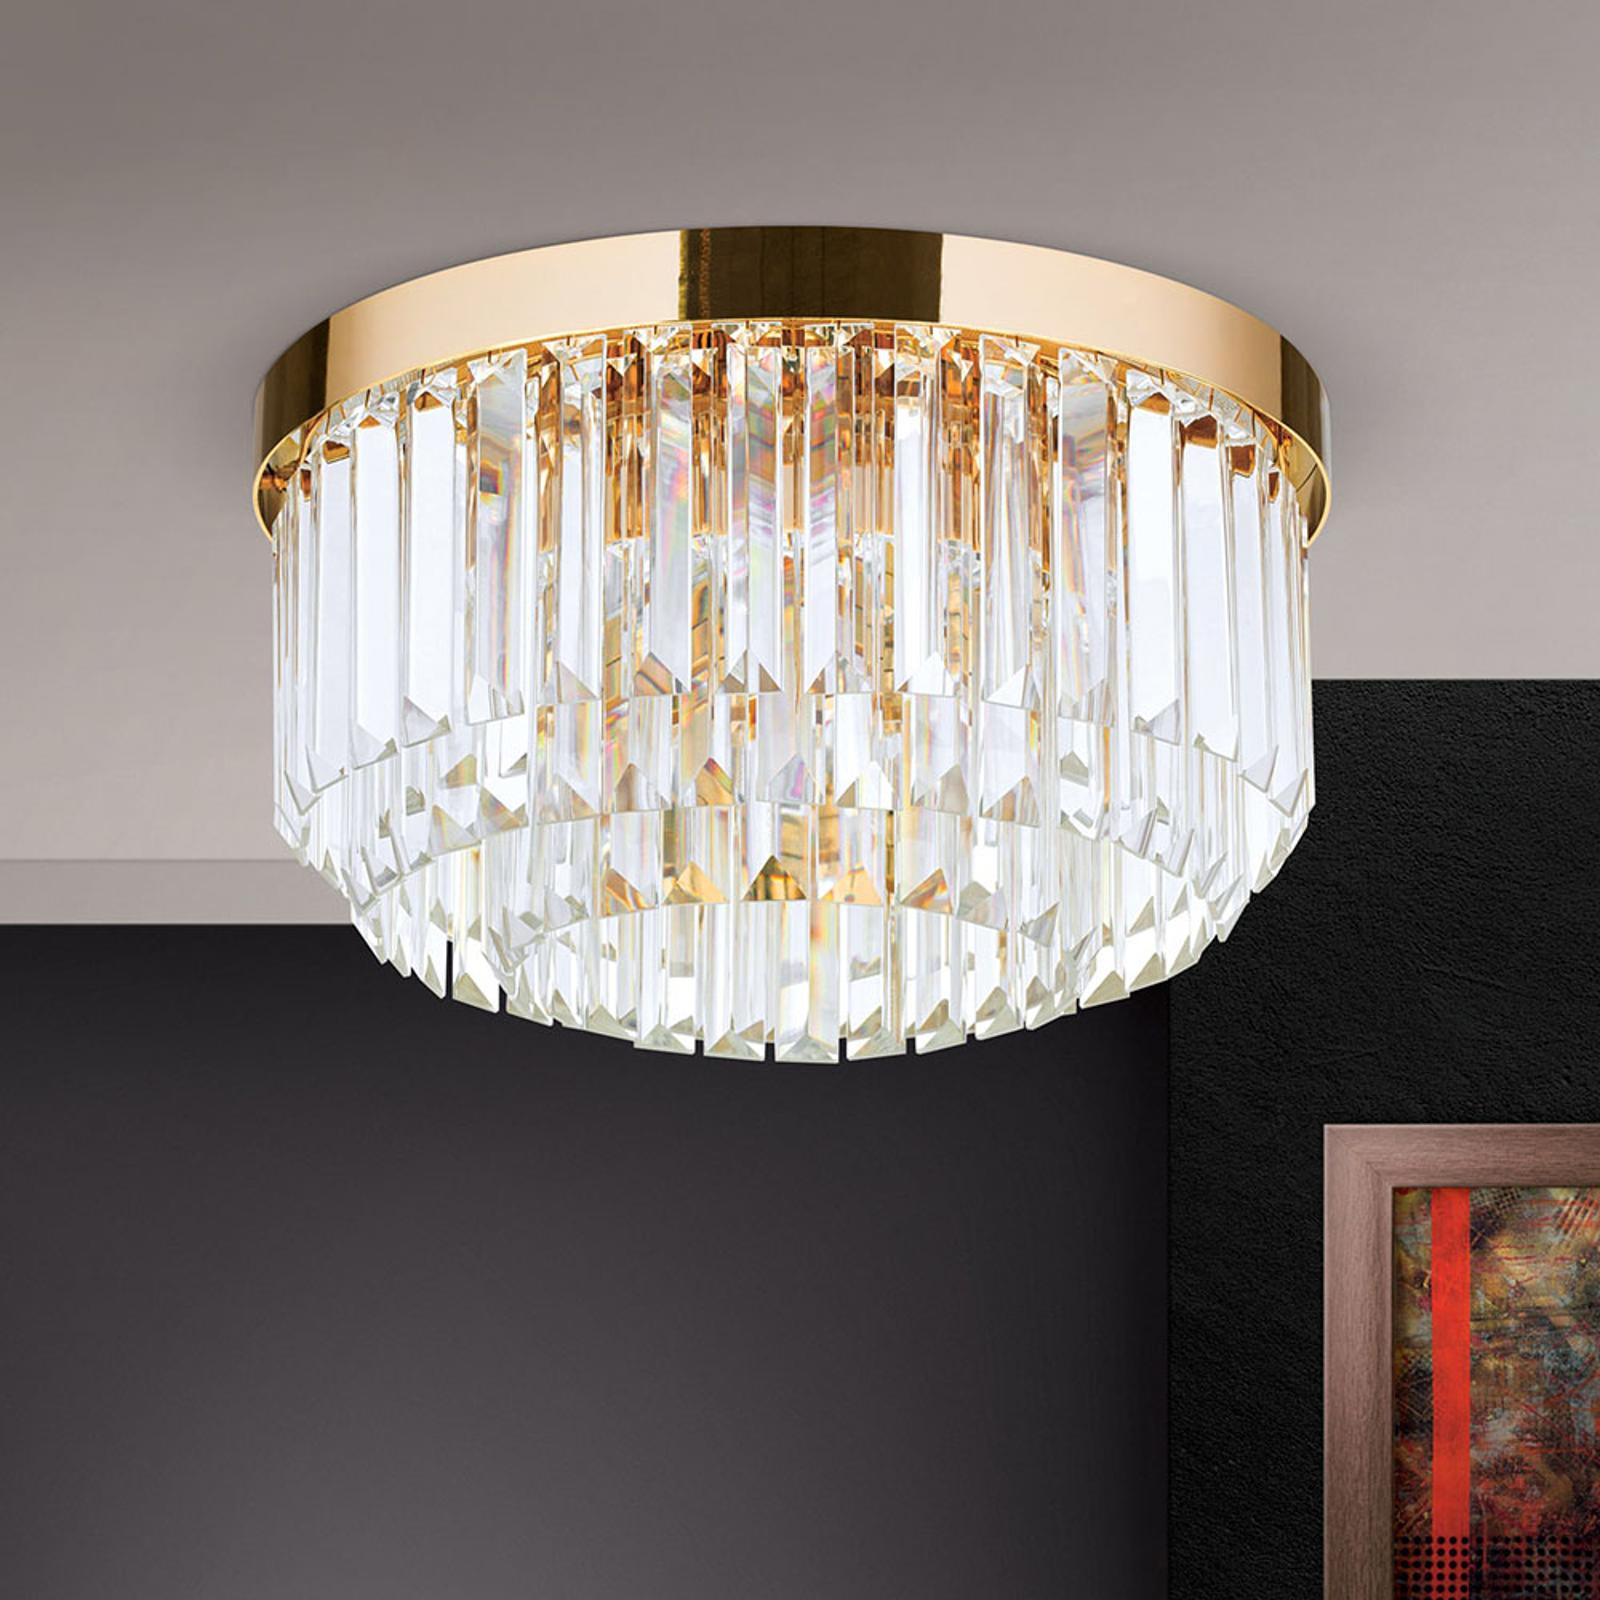 LED-kattovalaisin Prism, kulta, Ø 35 cm